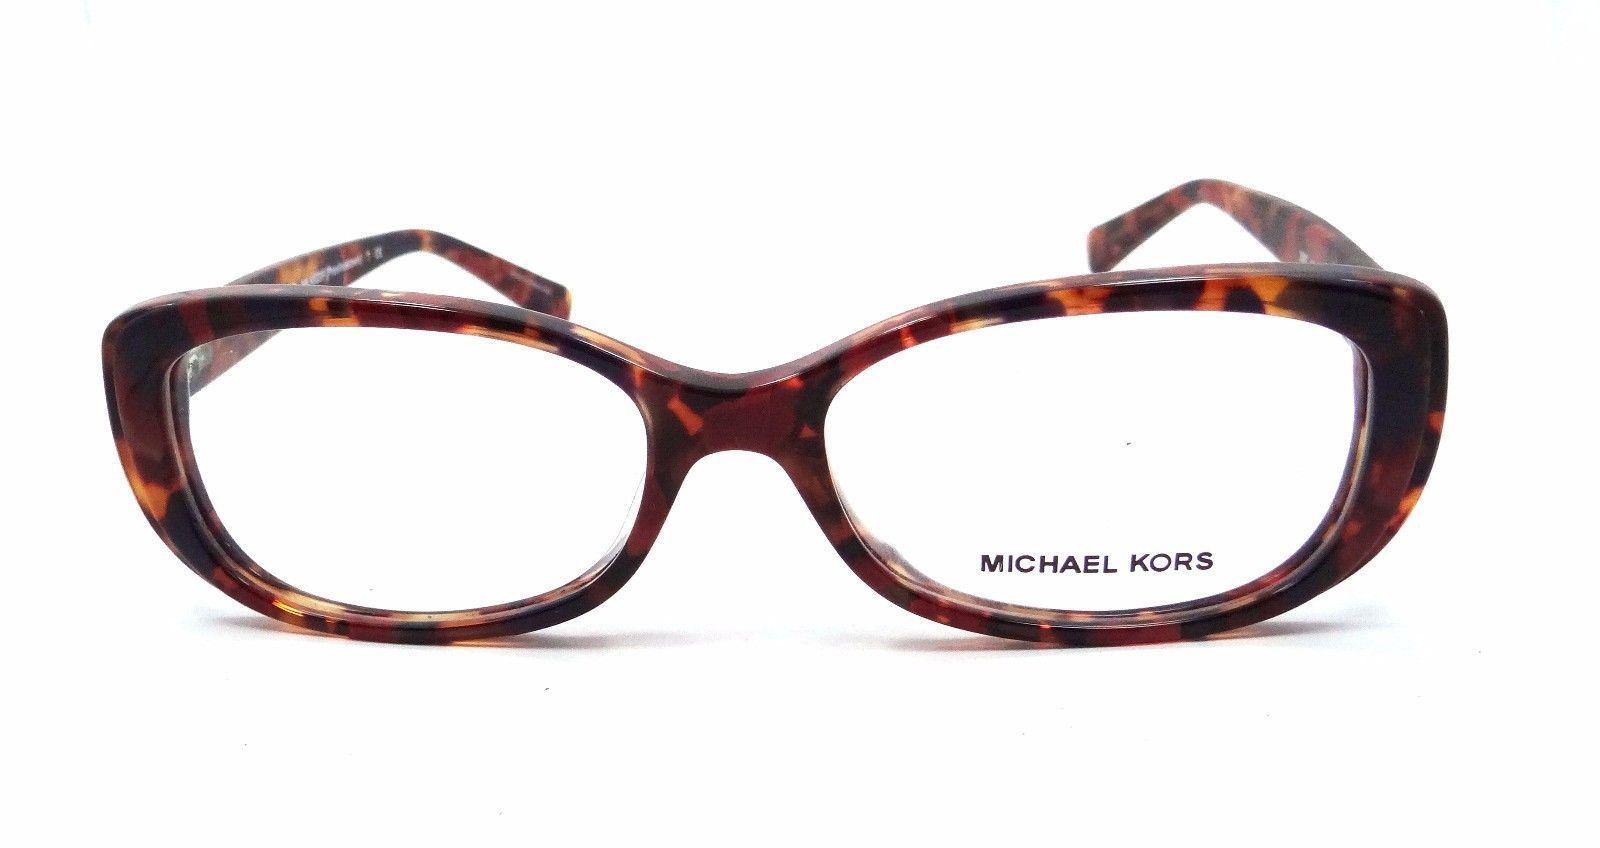 Michael Kors Rx Eyeglasses Frames MK 4023F 3067 Province Town 54x16 Red Tortoise